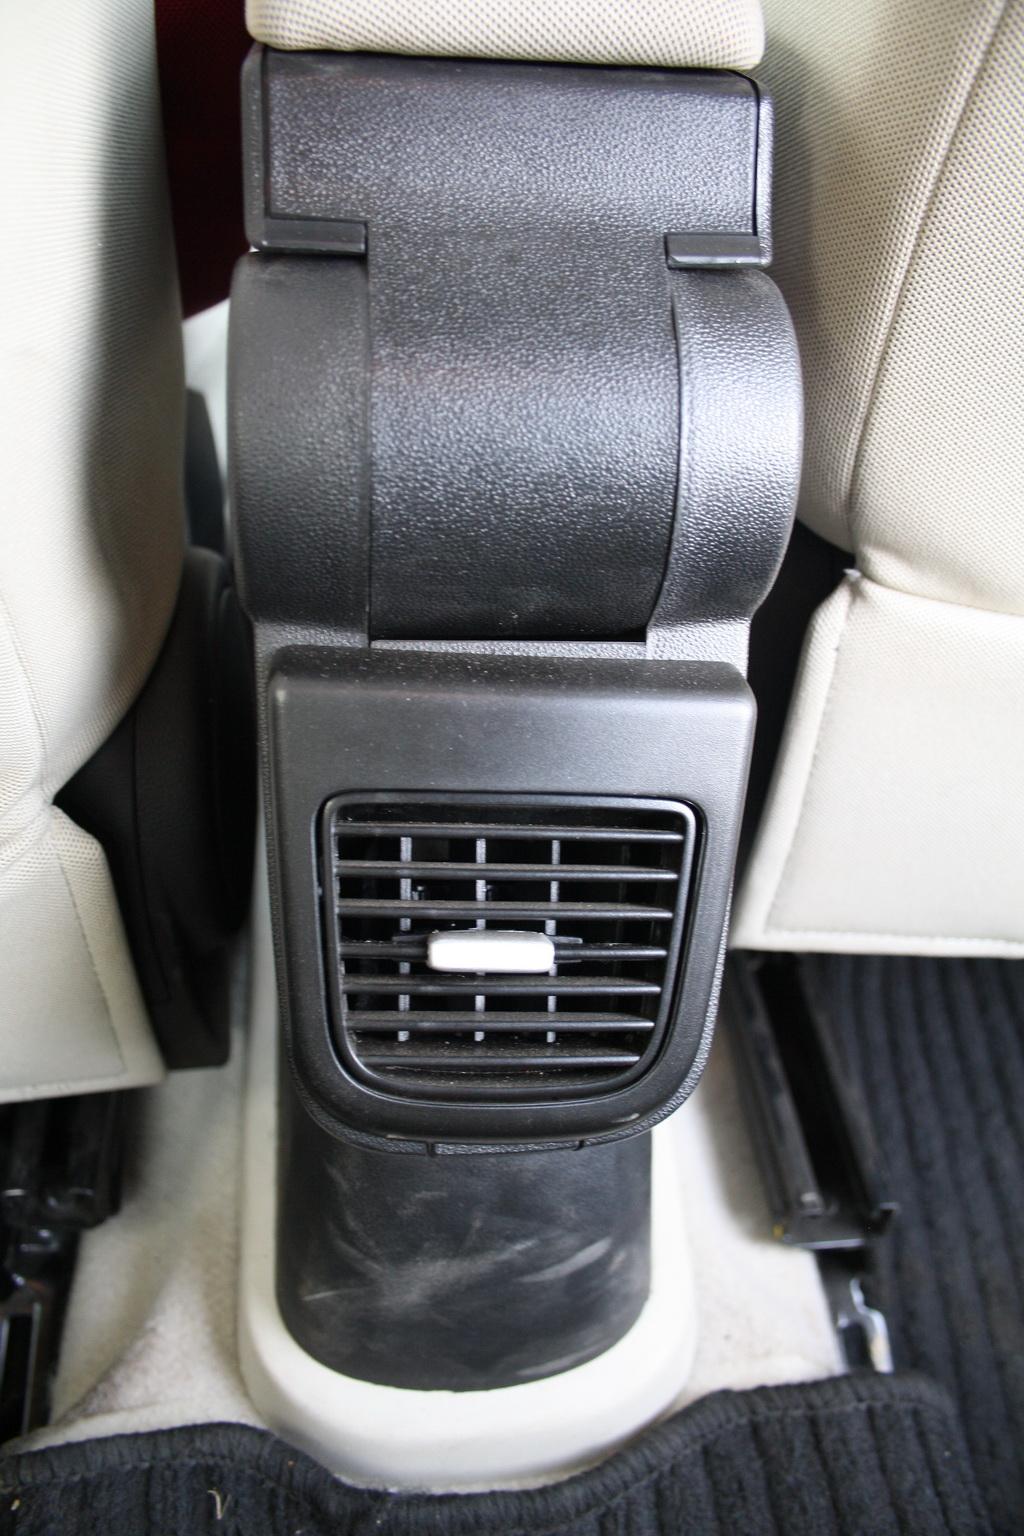 2012 Fiat Linea rear AC vents